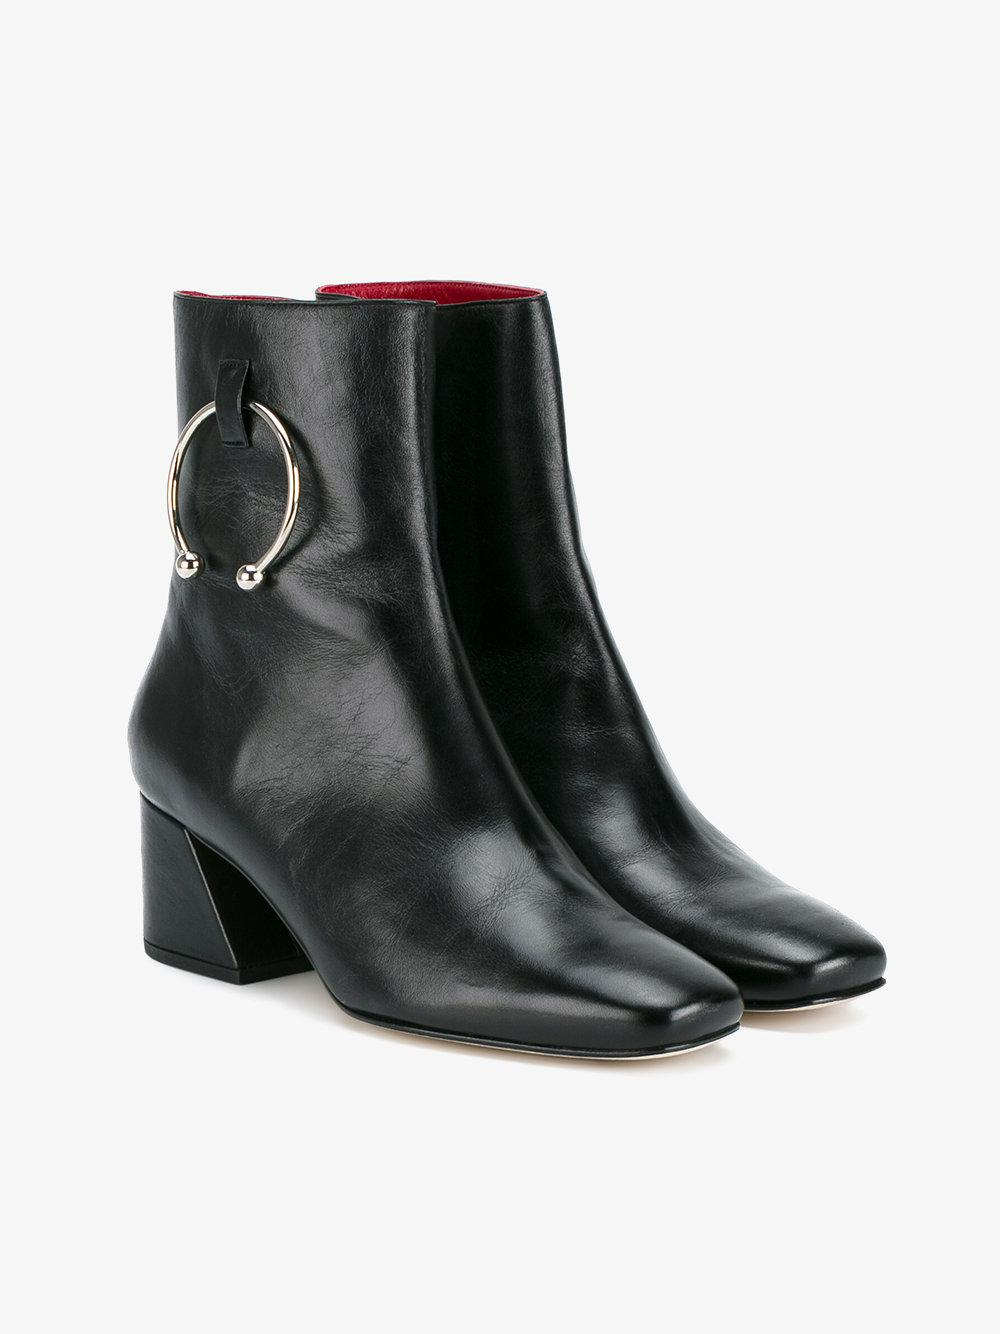 Dorateymur Black Leather Nizip 60 Boots in Blue